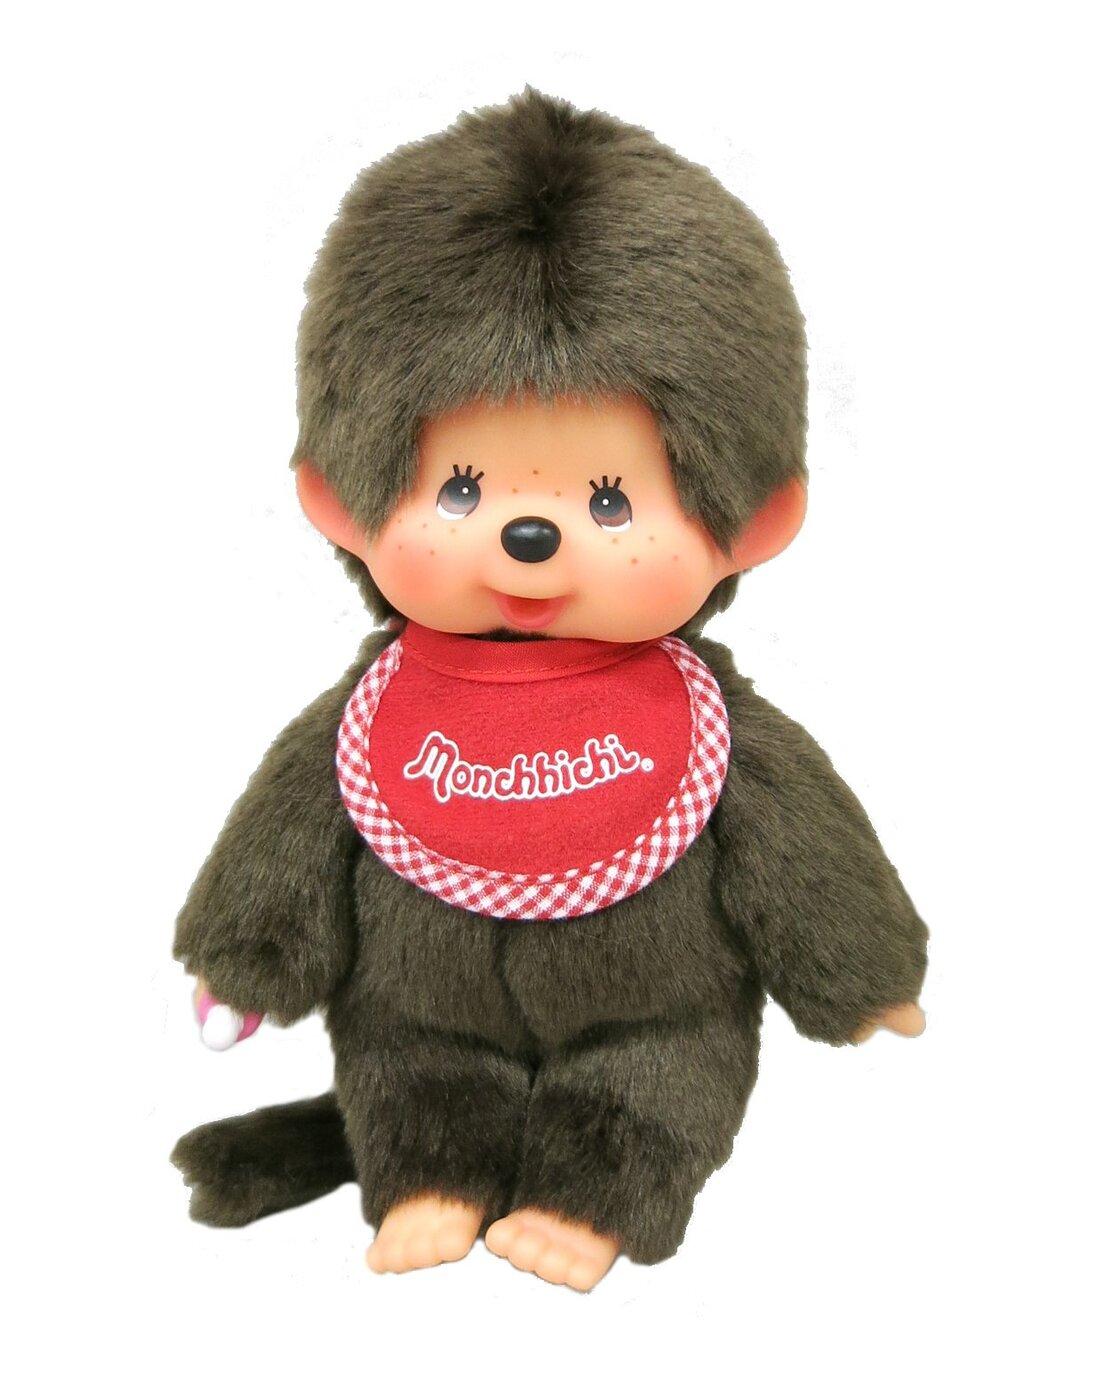 "Monchhichi Original Sekiguchi 8.45"" Tall Brown Boys Doll Standard with a Red Bib"